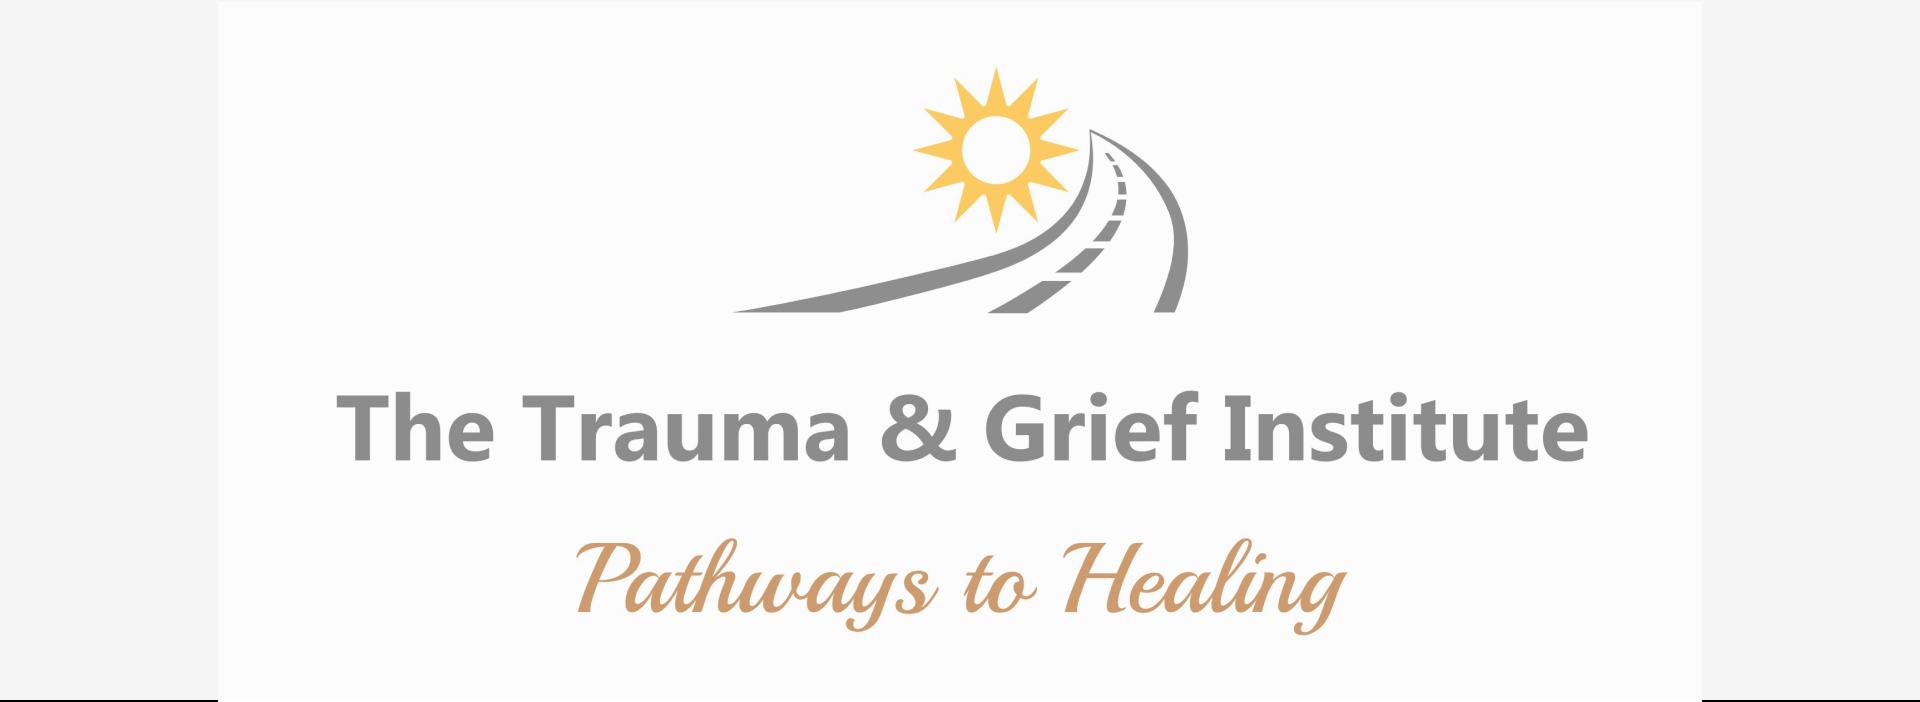 The Trauma & Grief Institute